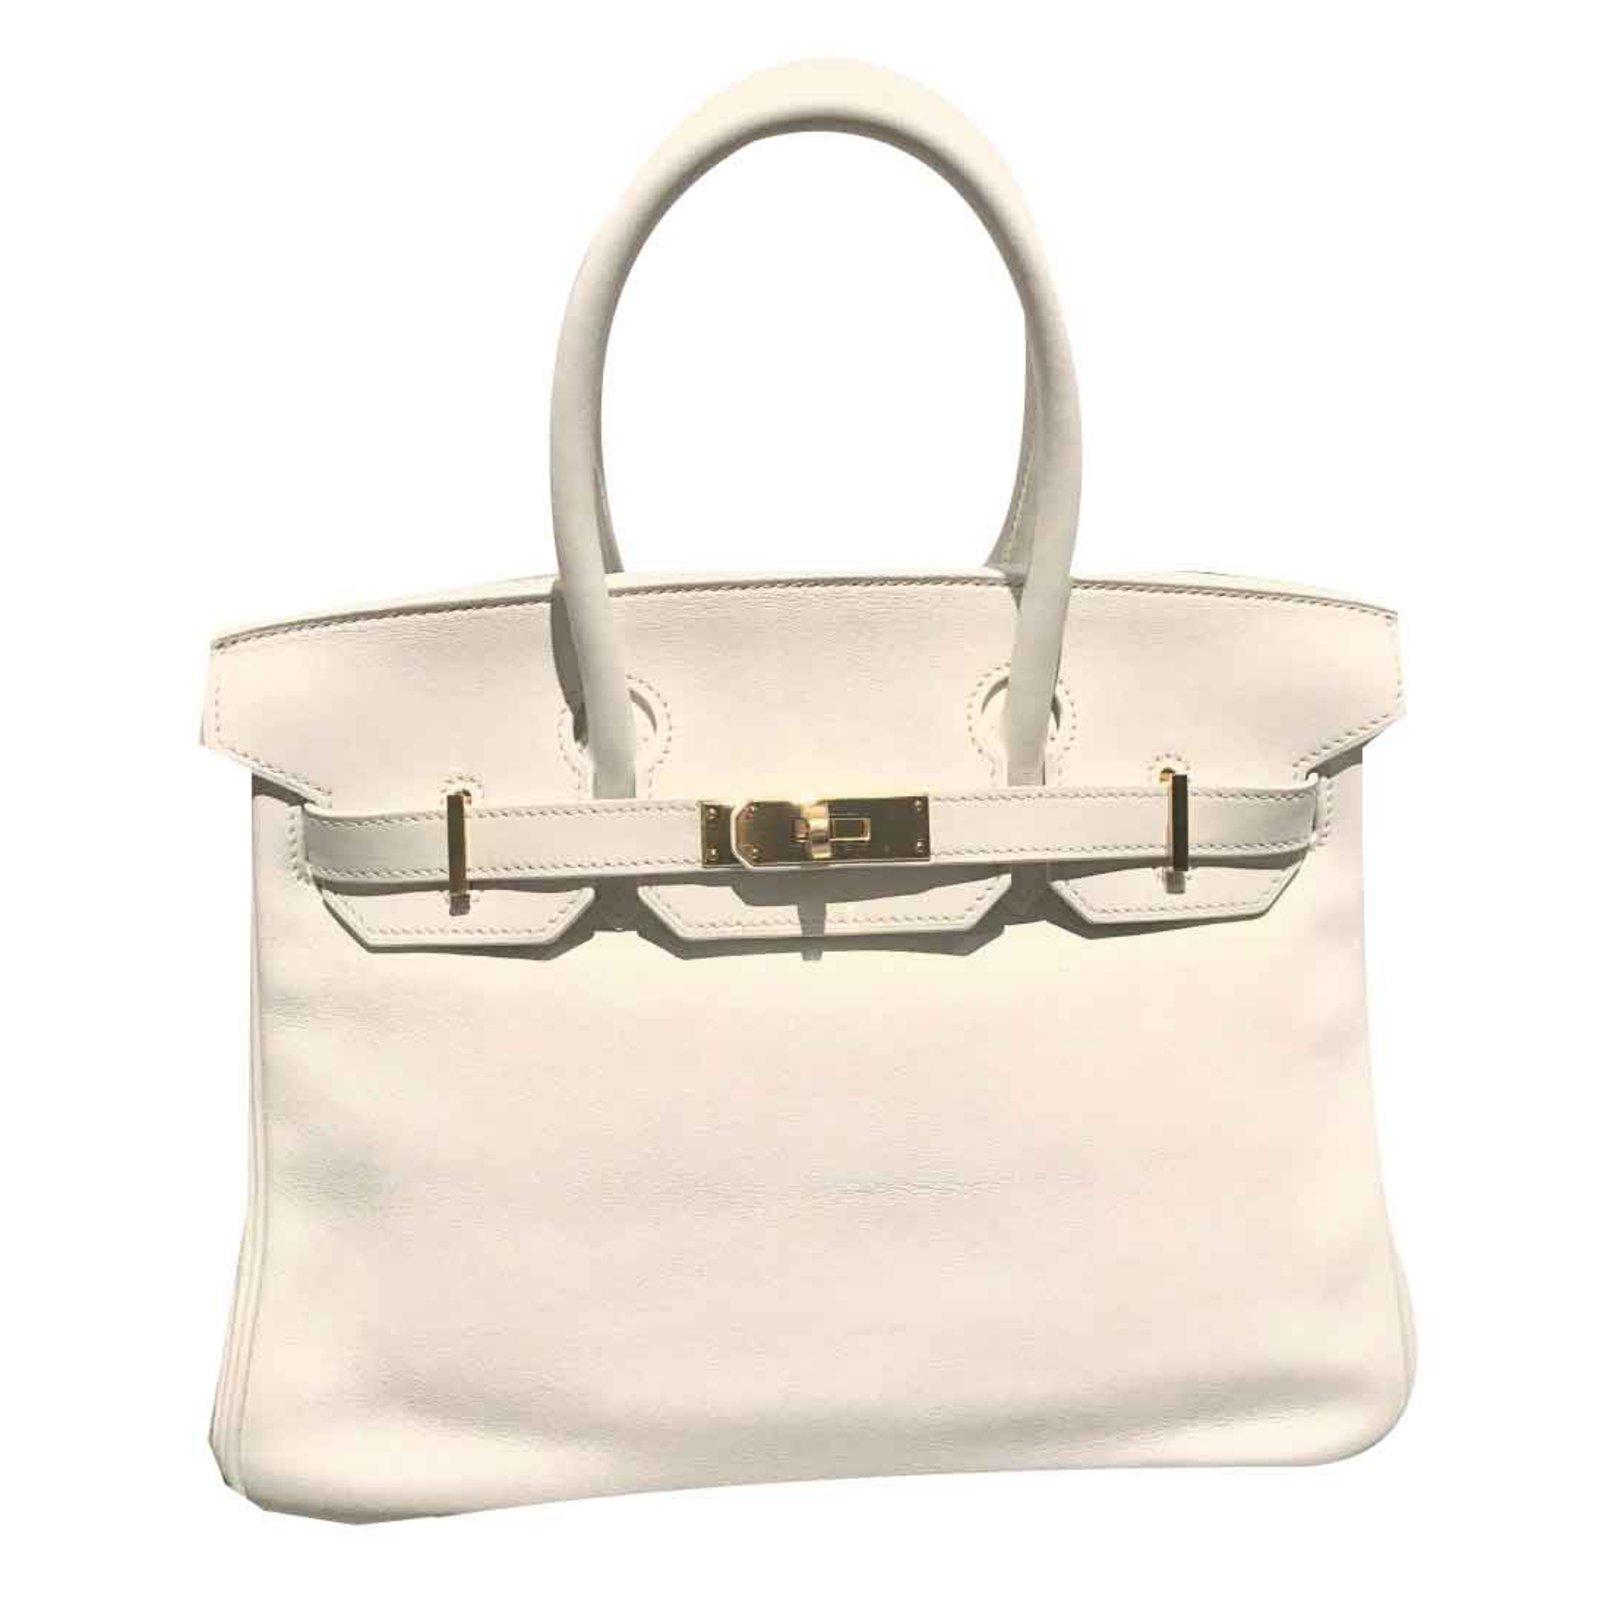 6537e72ab0 Hermès White Swift Birkin 30 GHW Handbags Leather White ref.92095 - Joli  Closet